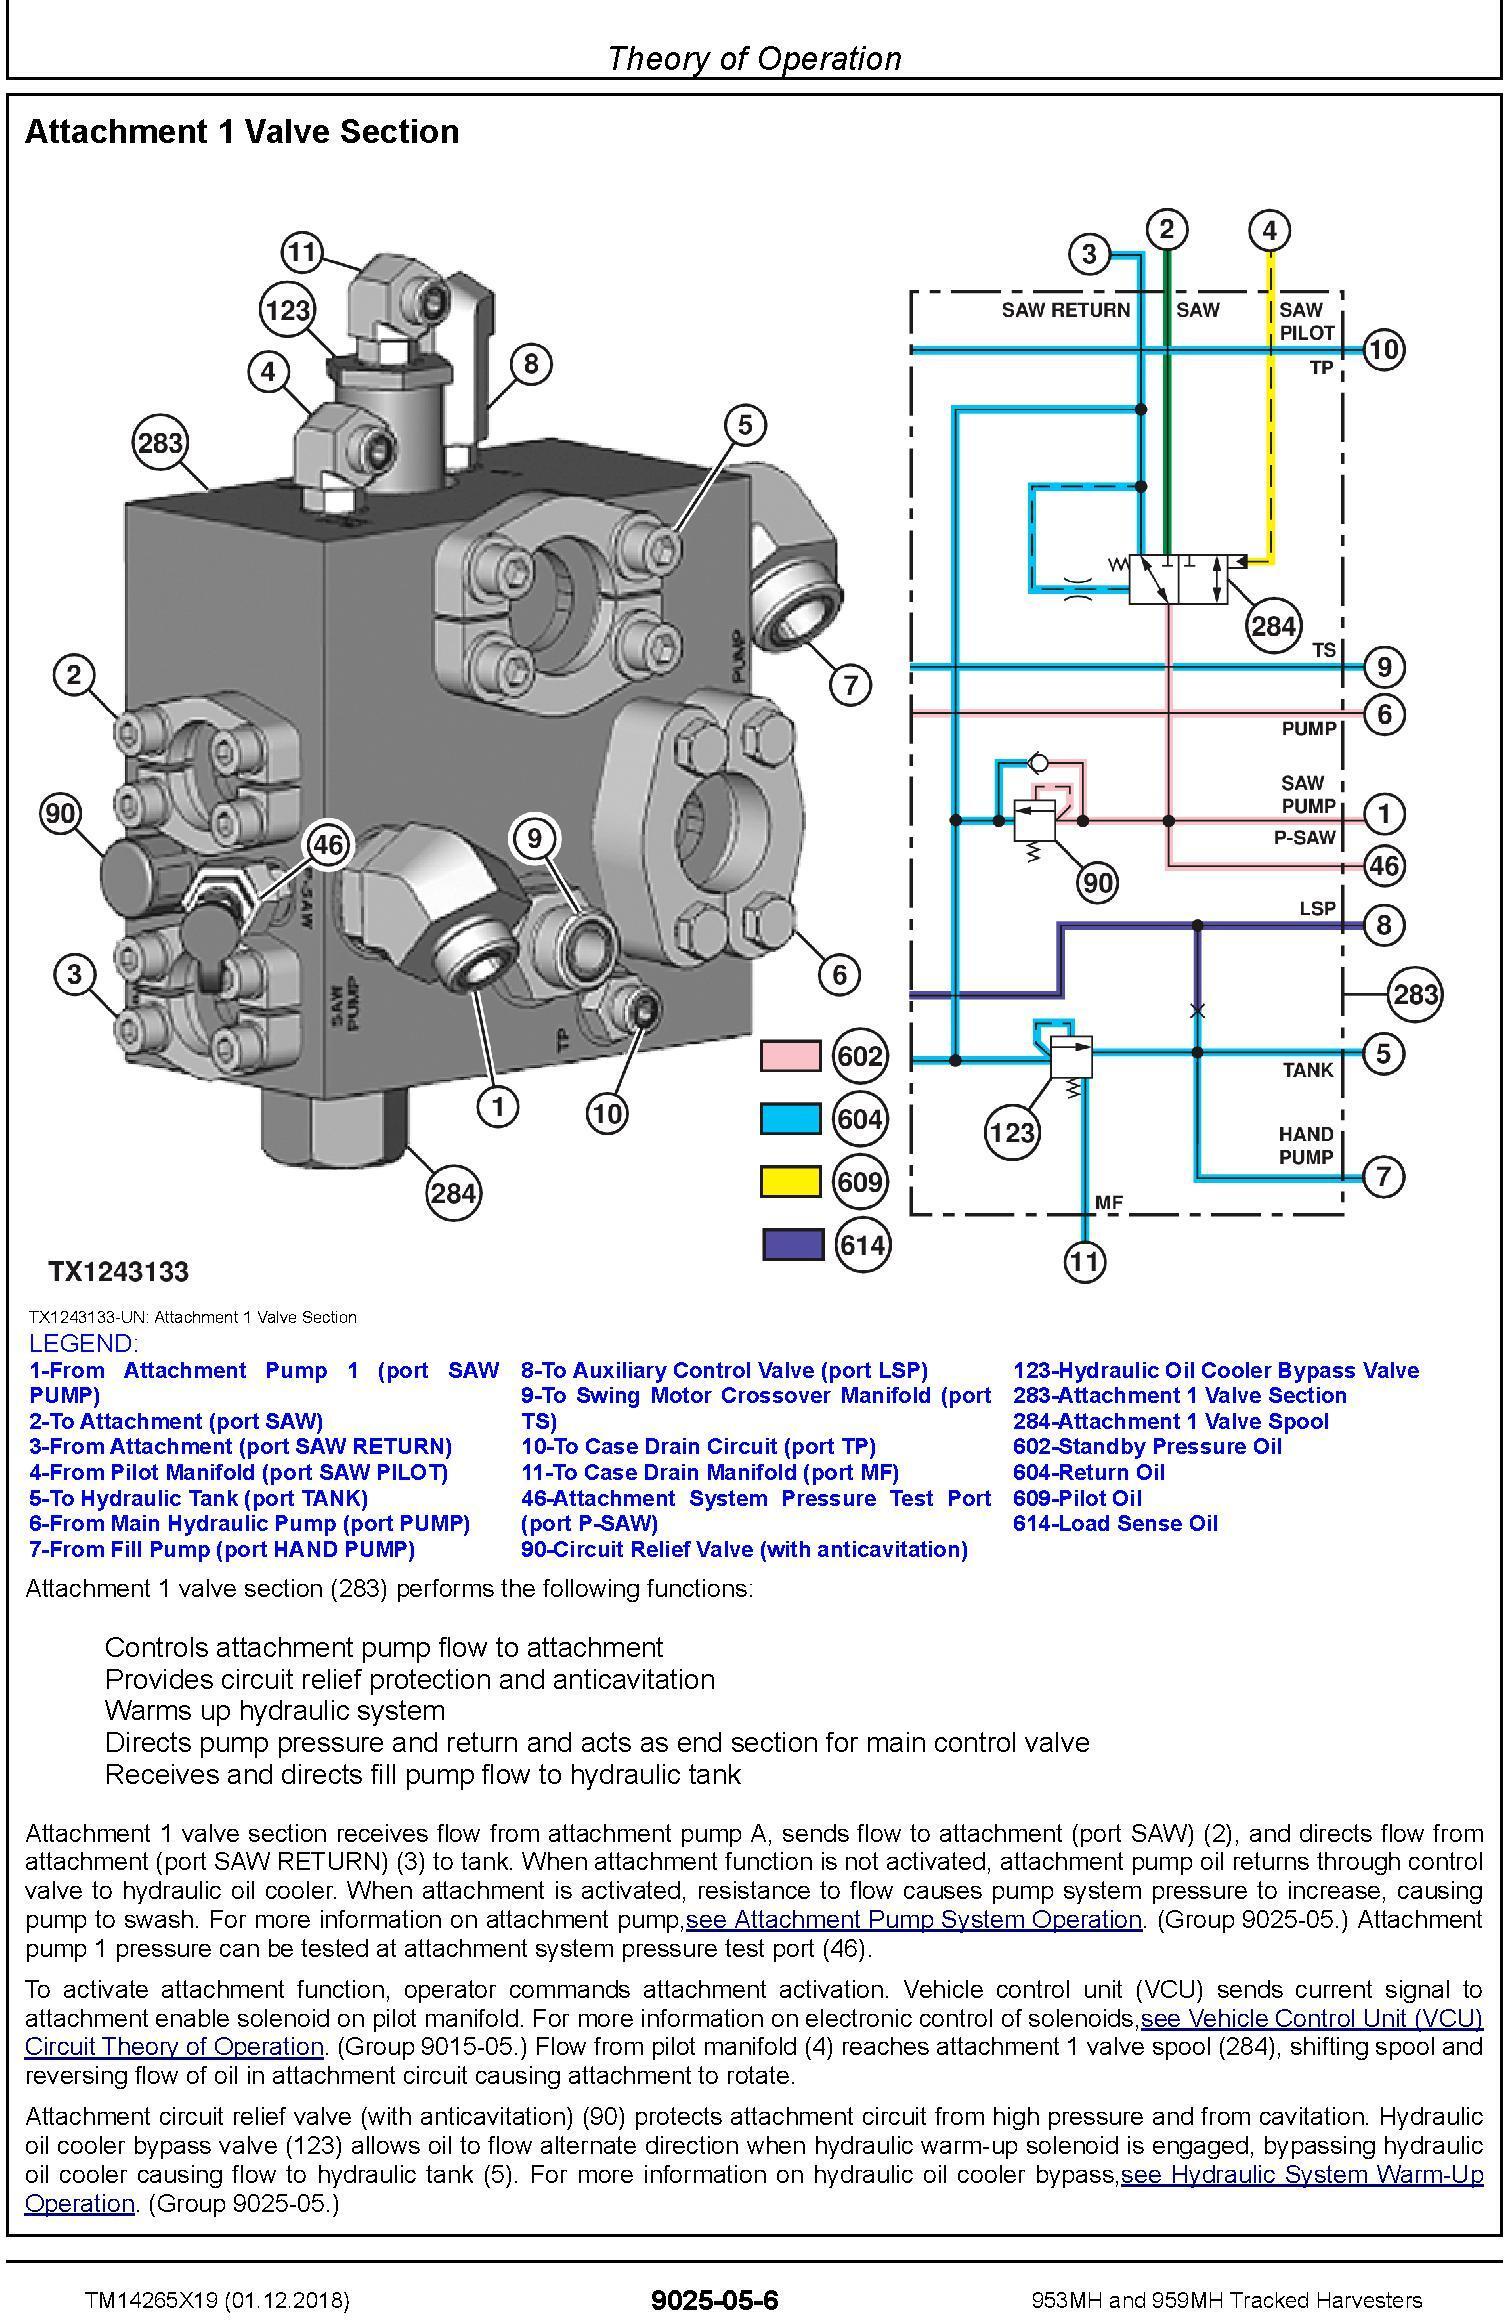 John Deere 953MH, 959MH (SN. F317982-, L317982-) Tracked Harvesters Diagnostic Manual (TM14265X19) - 2